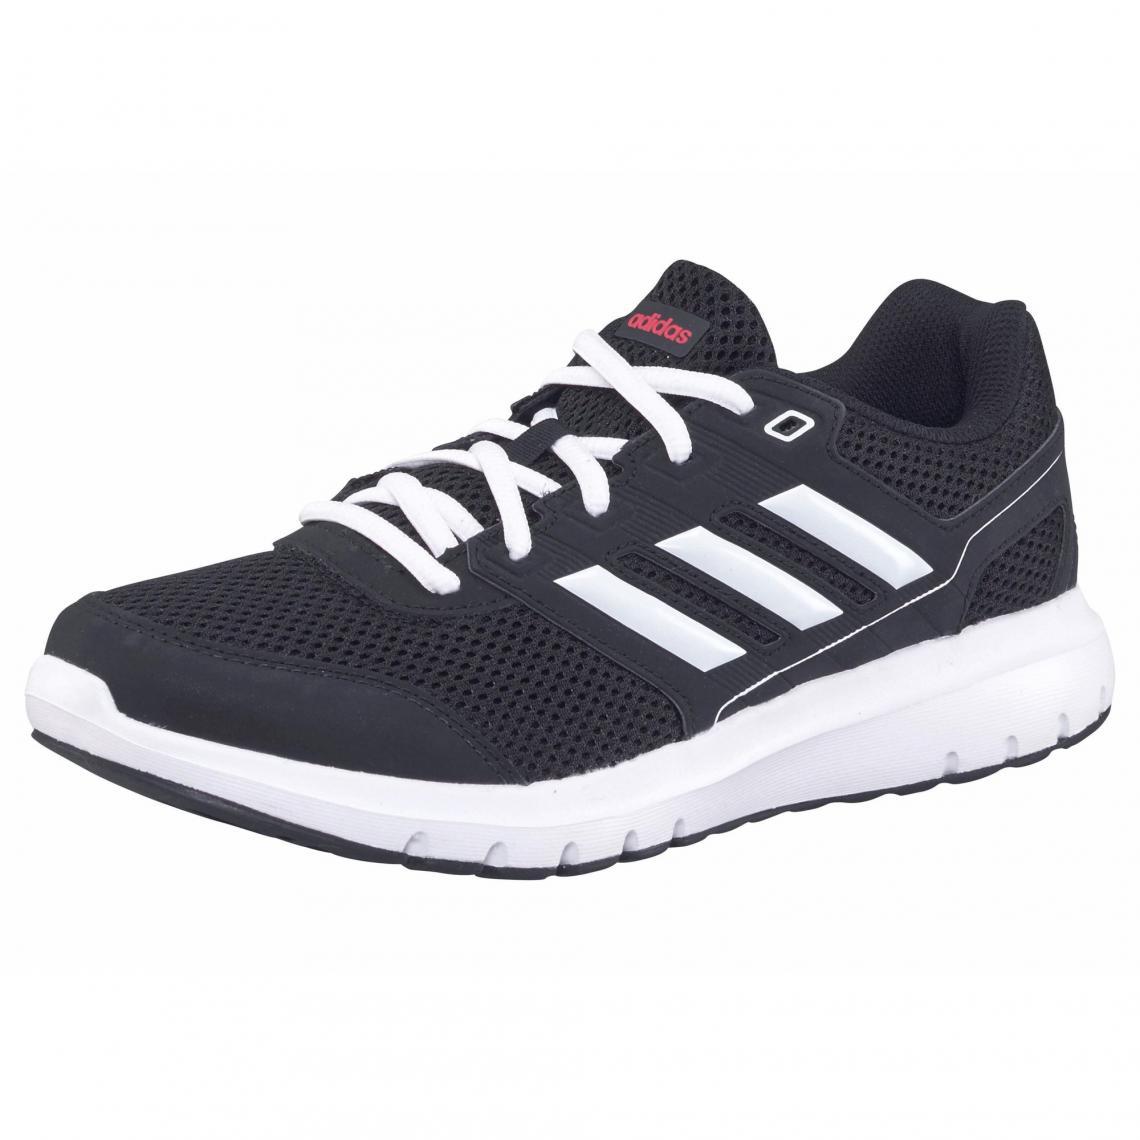 sports shoes 80126 8e80e adidas Performance Duramo Lite 2.0 chaussures de running femme - Noir -  Blanc Adidas Femme